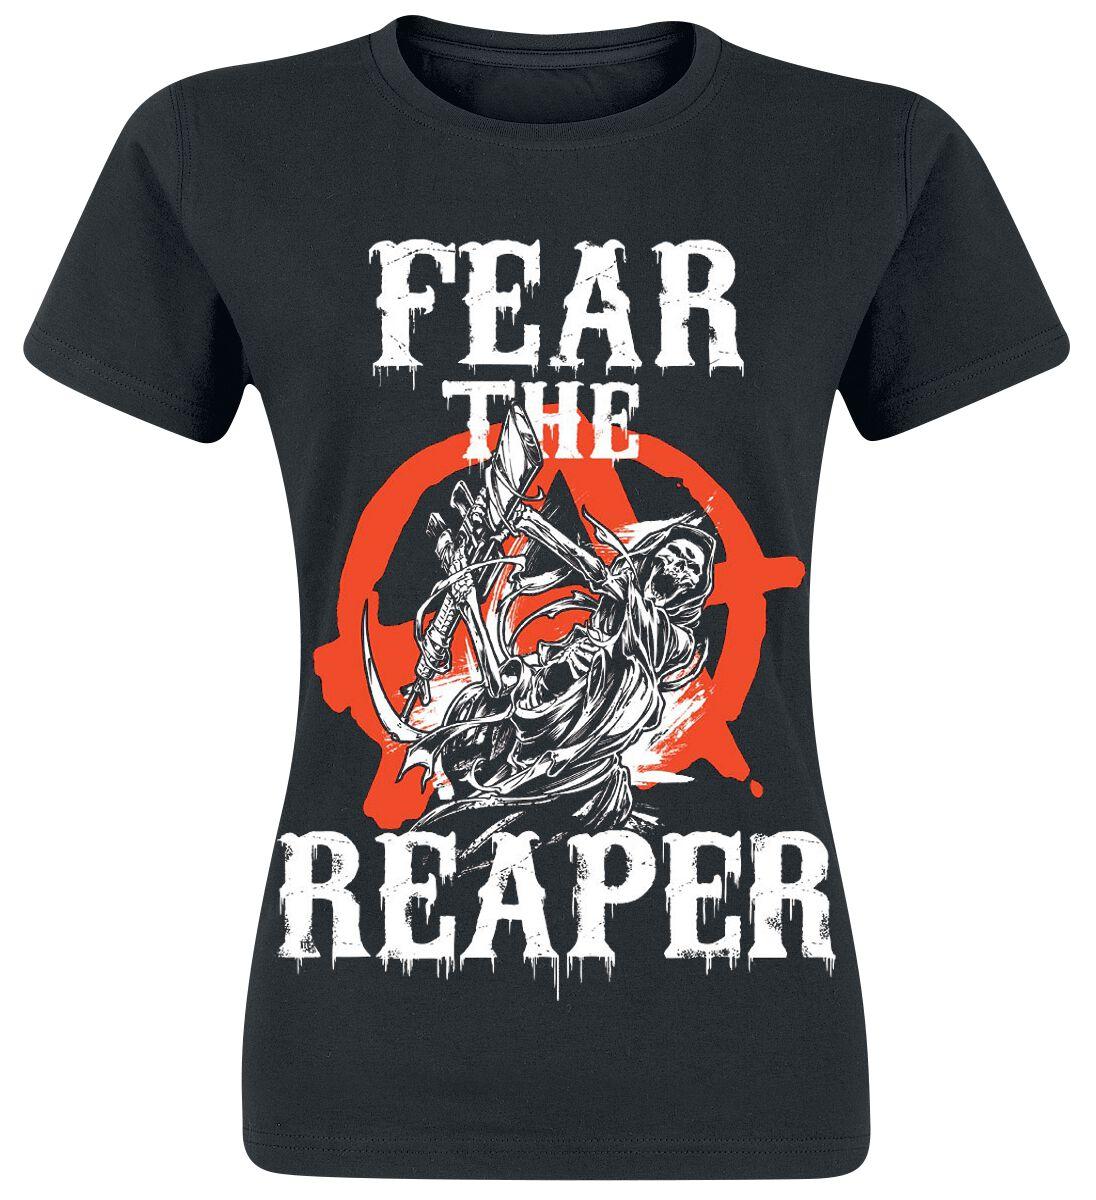 Merch dla Fanów - Koszulki - Koszulka damska Sons Of Anarchy Fear The Reaper Koszulka damska czarny - 359374